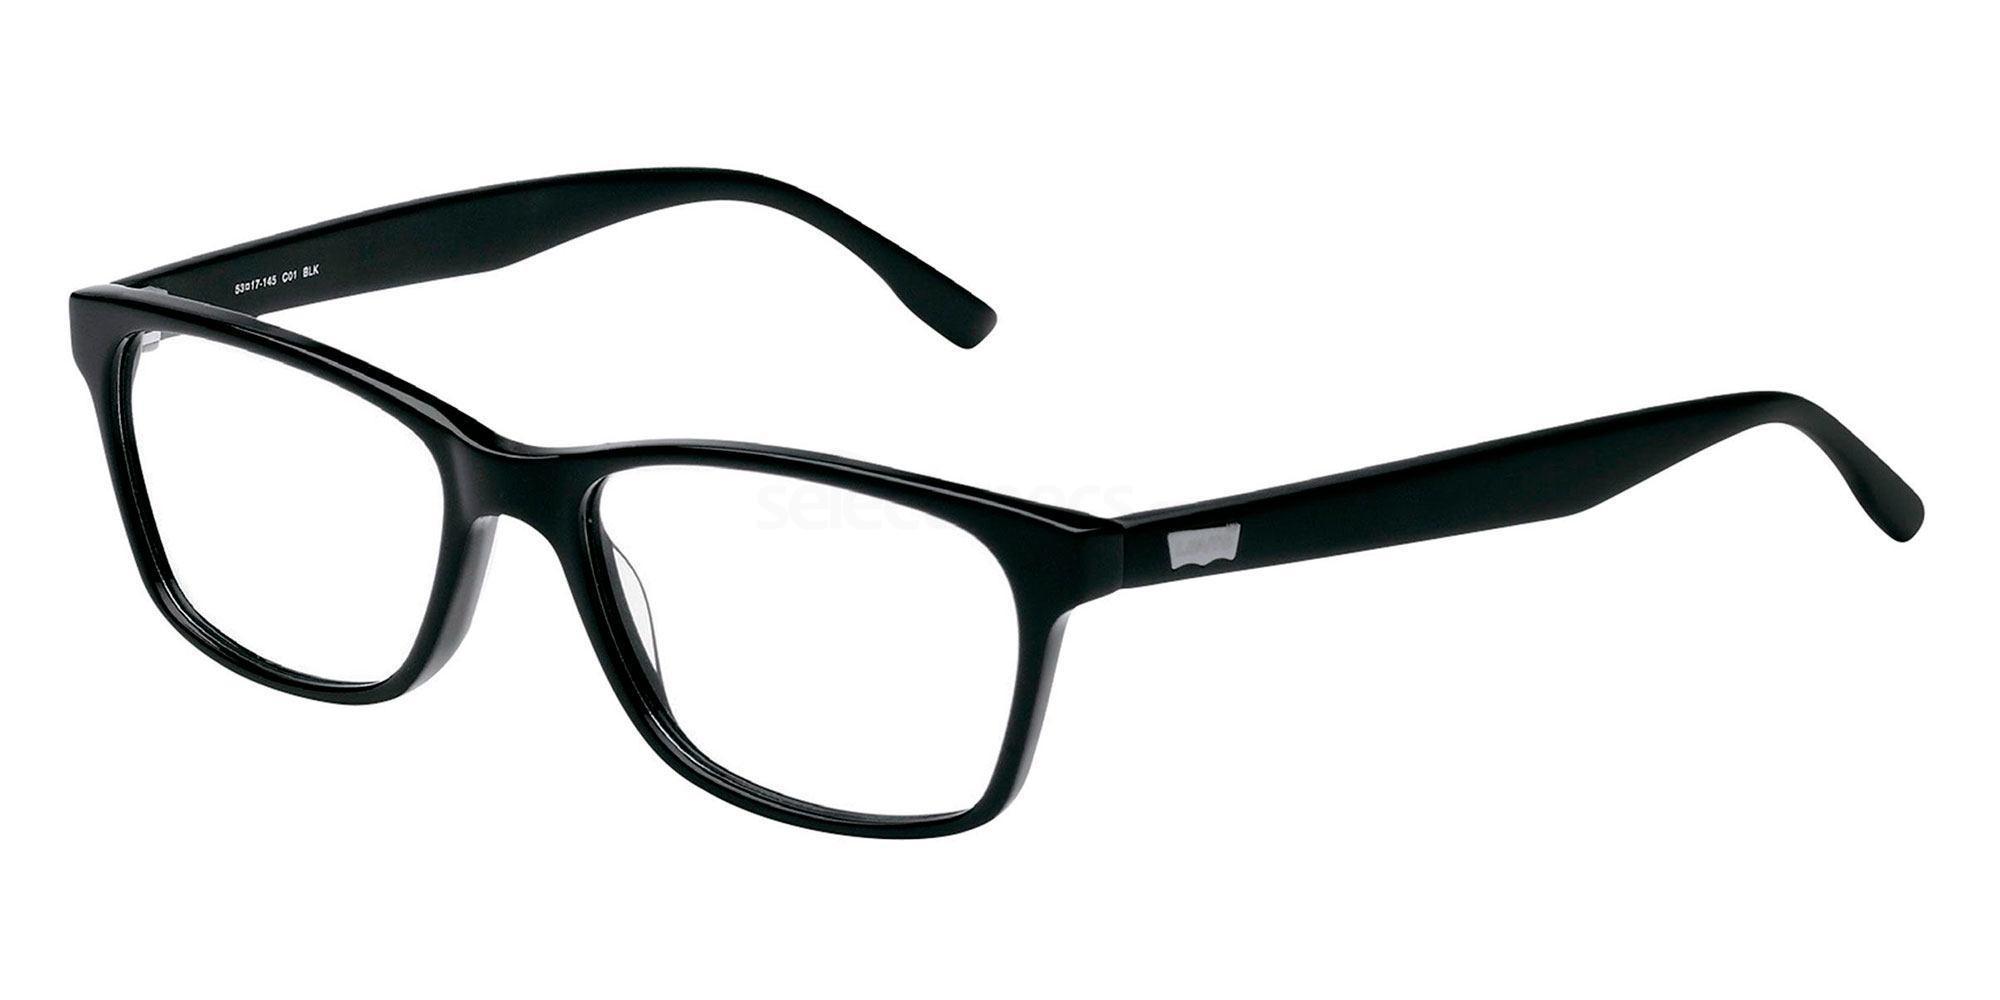 01 BLK LS116 Glasses, Levi's Eyewear